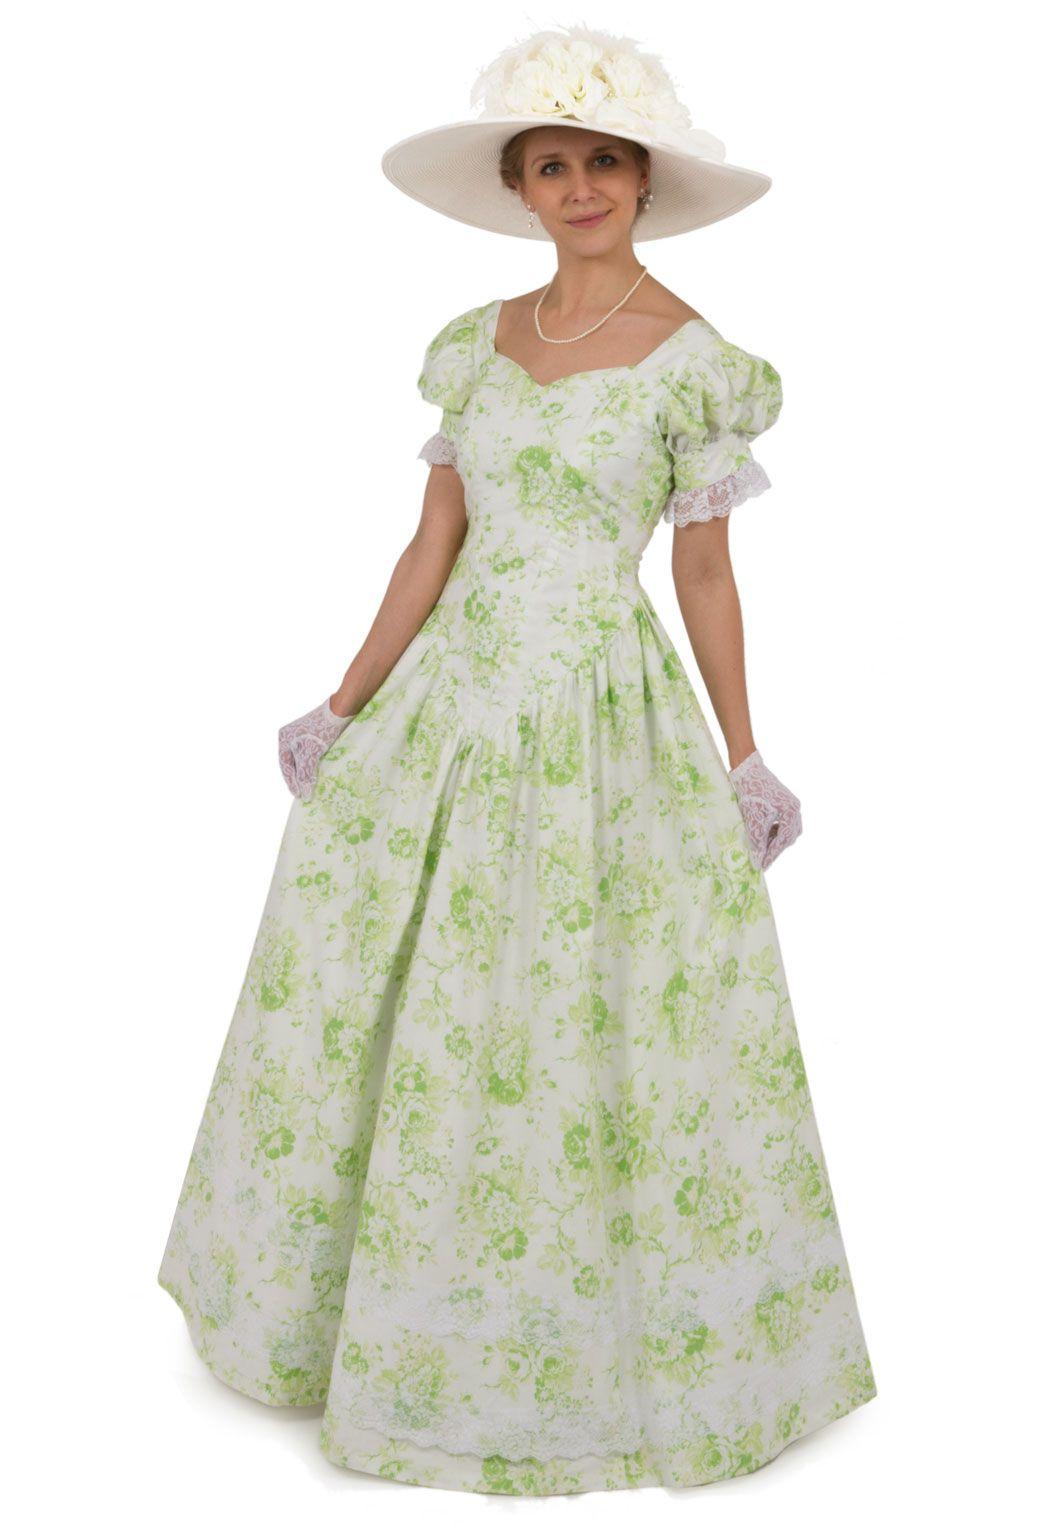 Mary Elizabeth Victorian Dress #dressesfromthesouthernbelleera